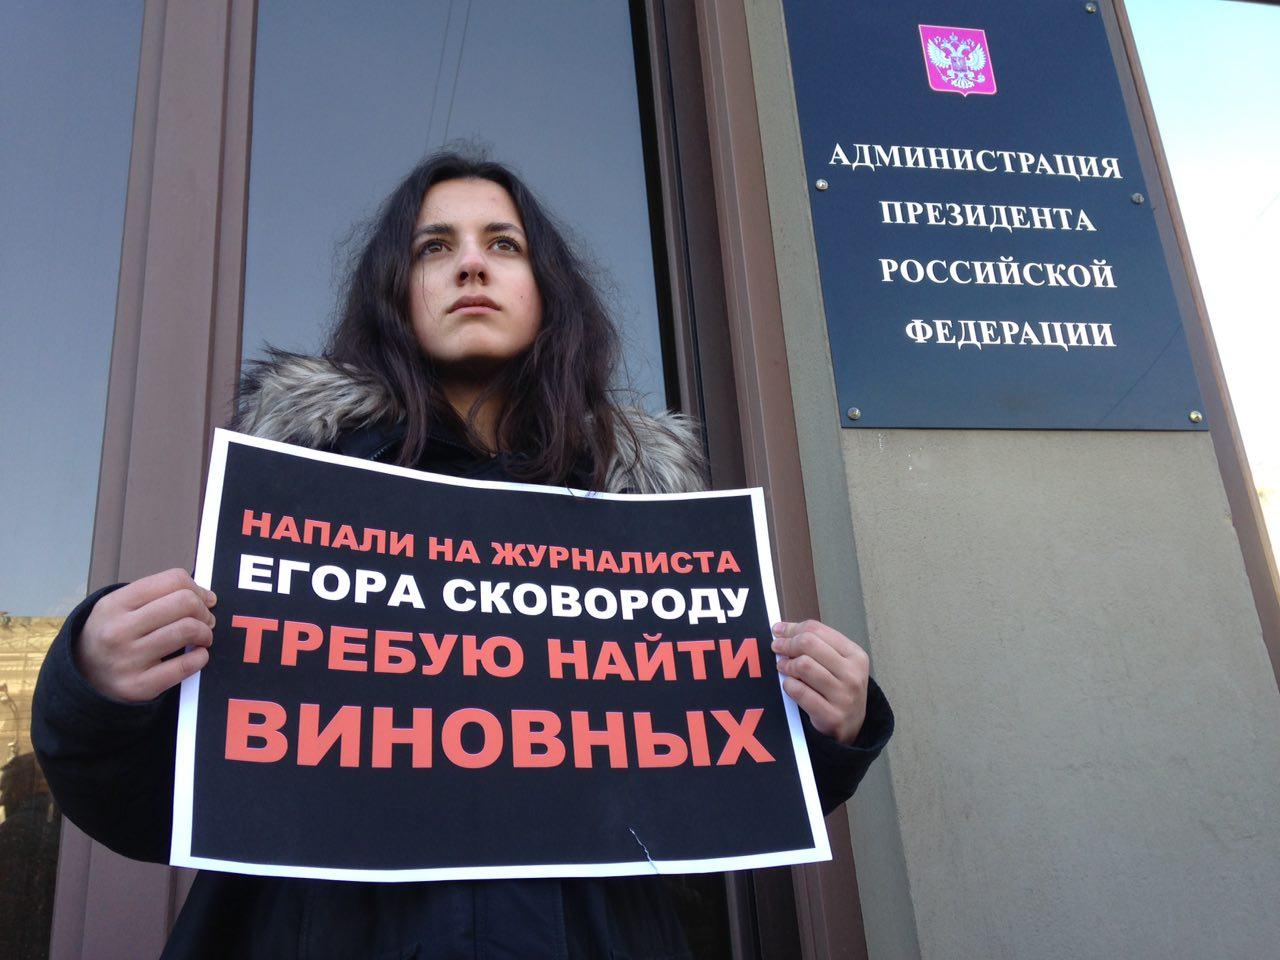 Амалия Затари, РБК.